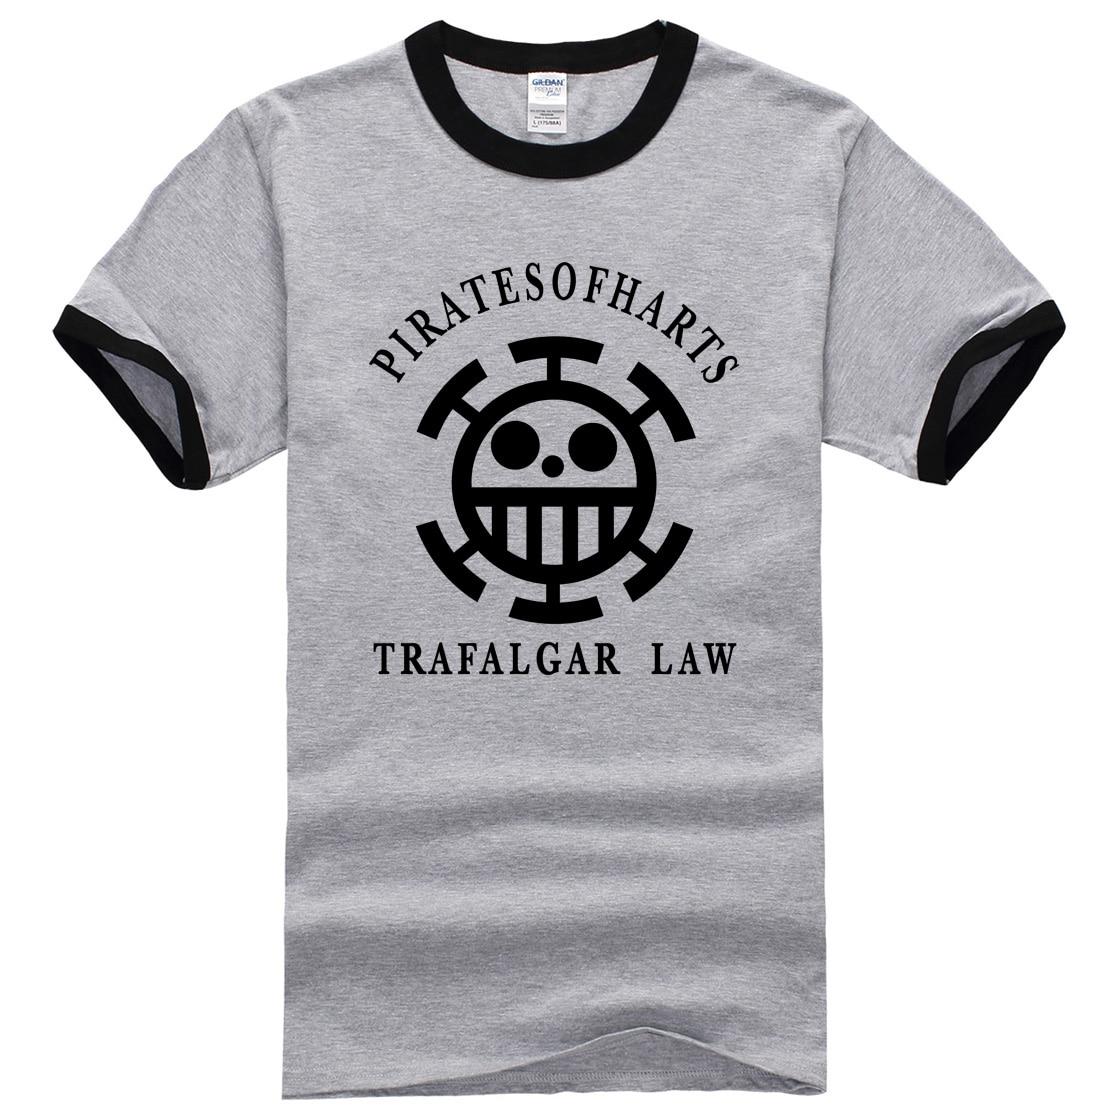 2017 new fashion brand fitness tops Anime One Piece trafalgar law streetwear hipster summer t shirt men boys clothes mma pp